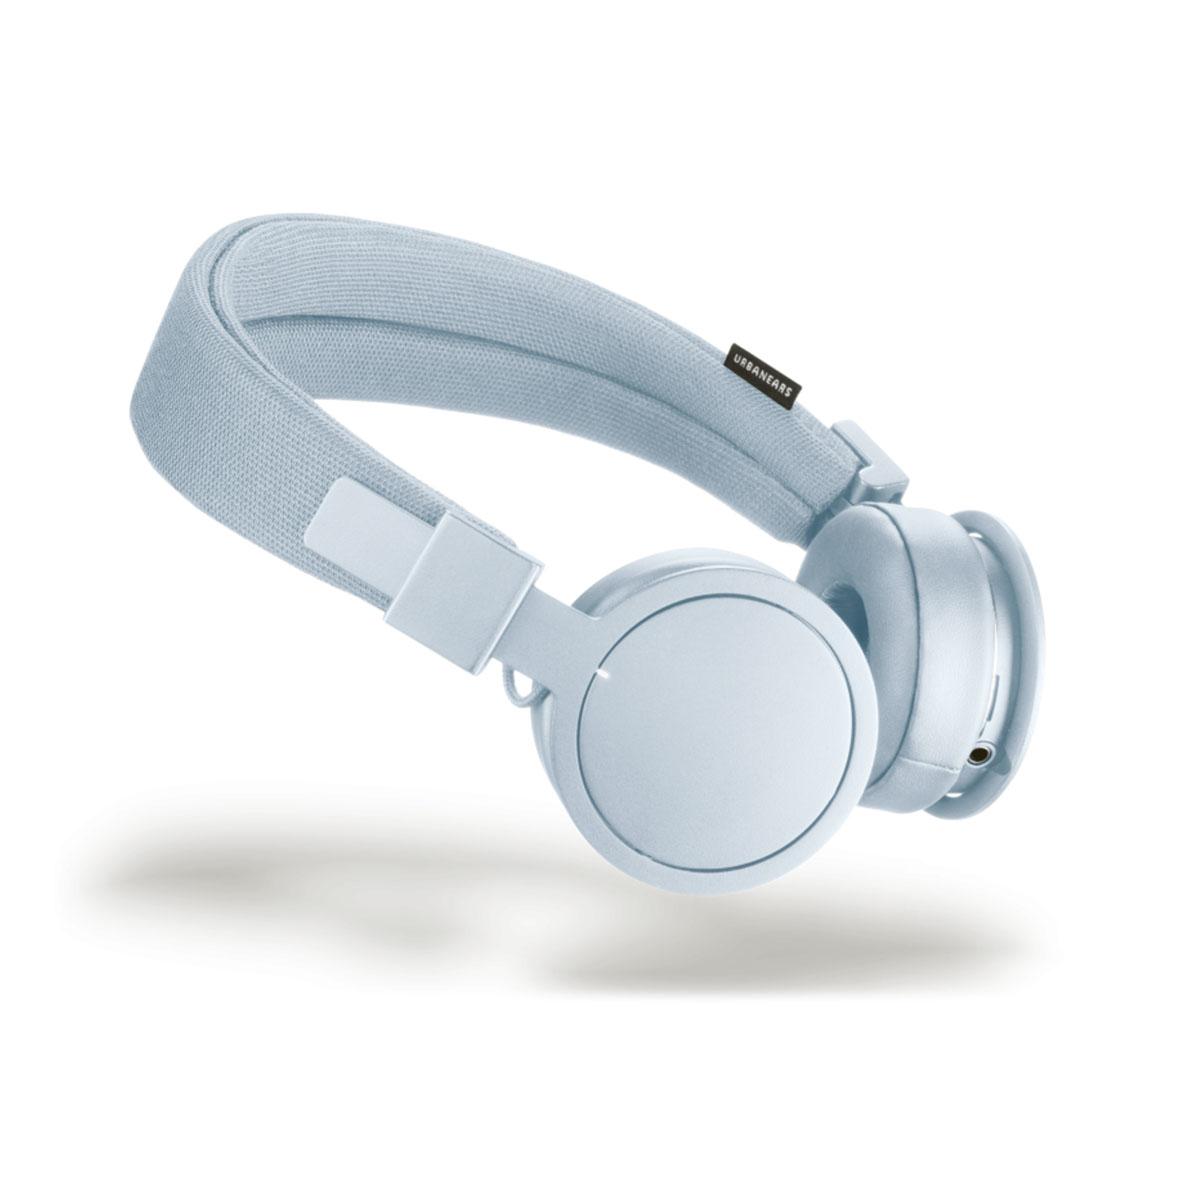 Sky blue ue wireless headphones